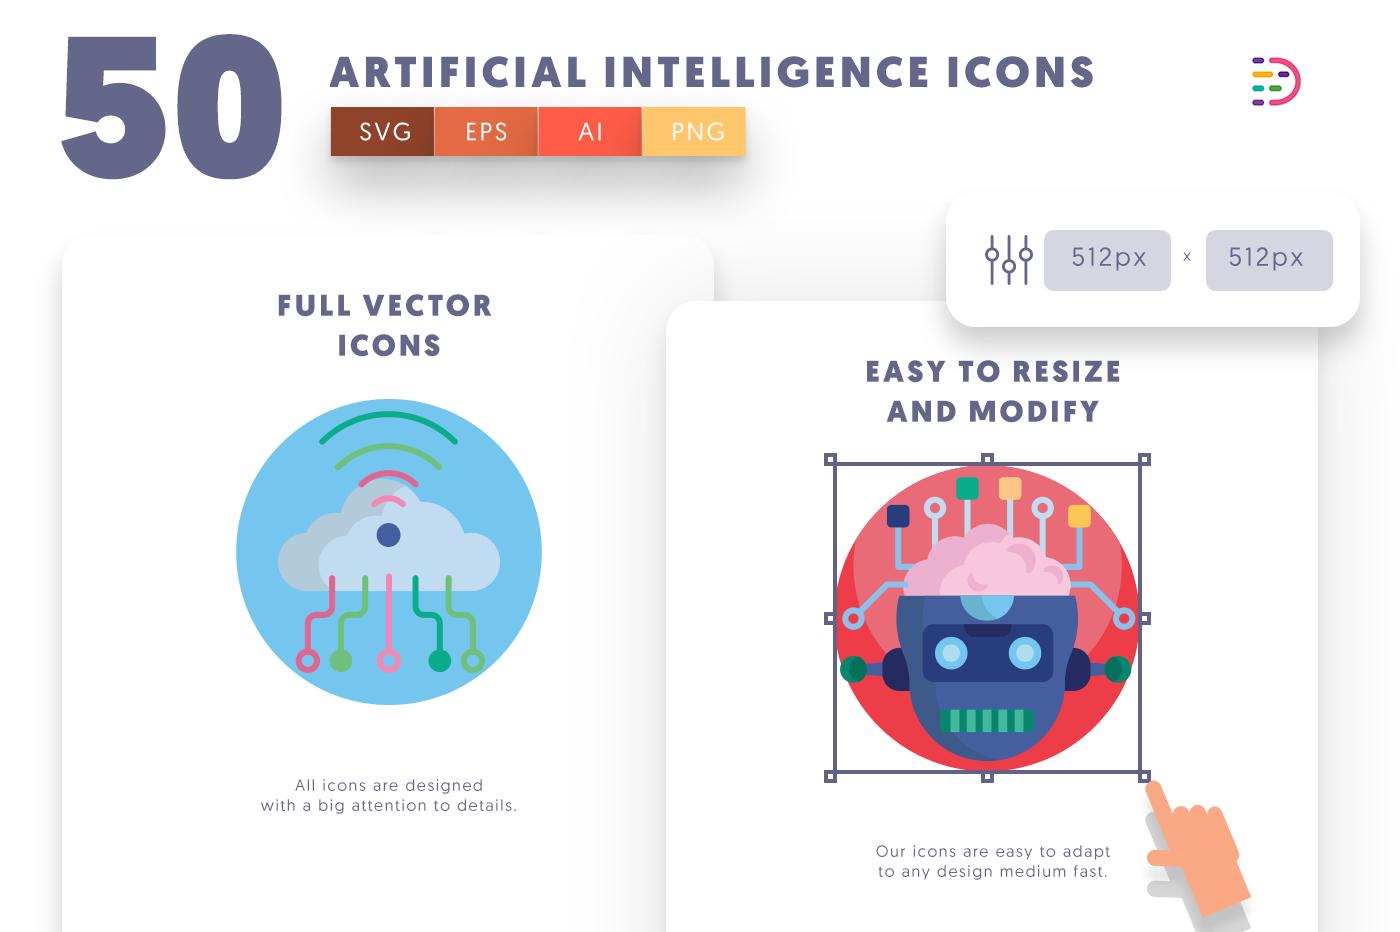 Full vector 50Artificialintelligence Icons